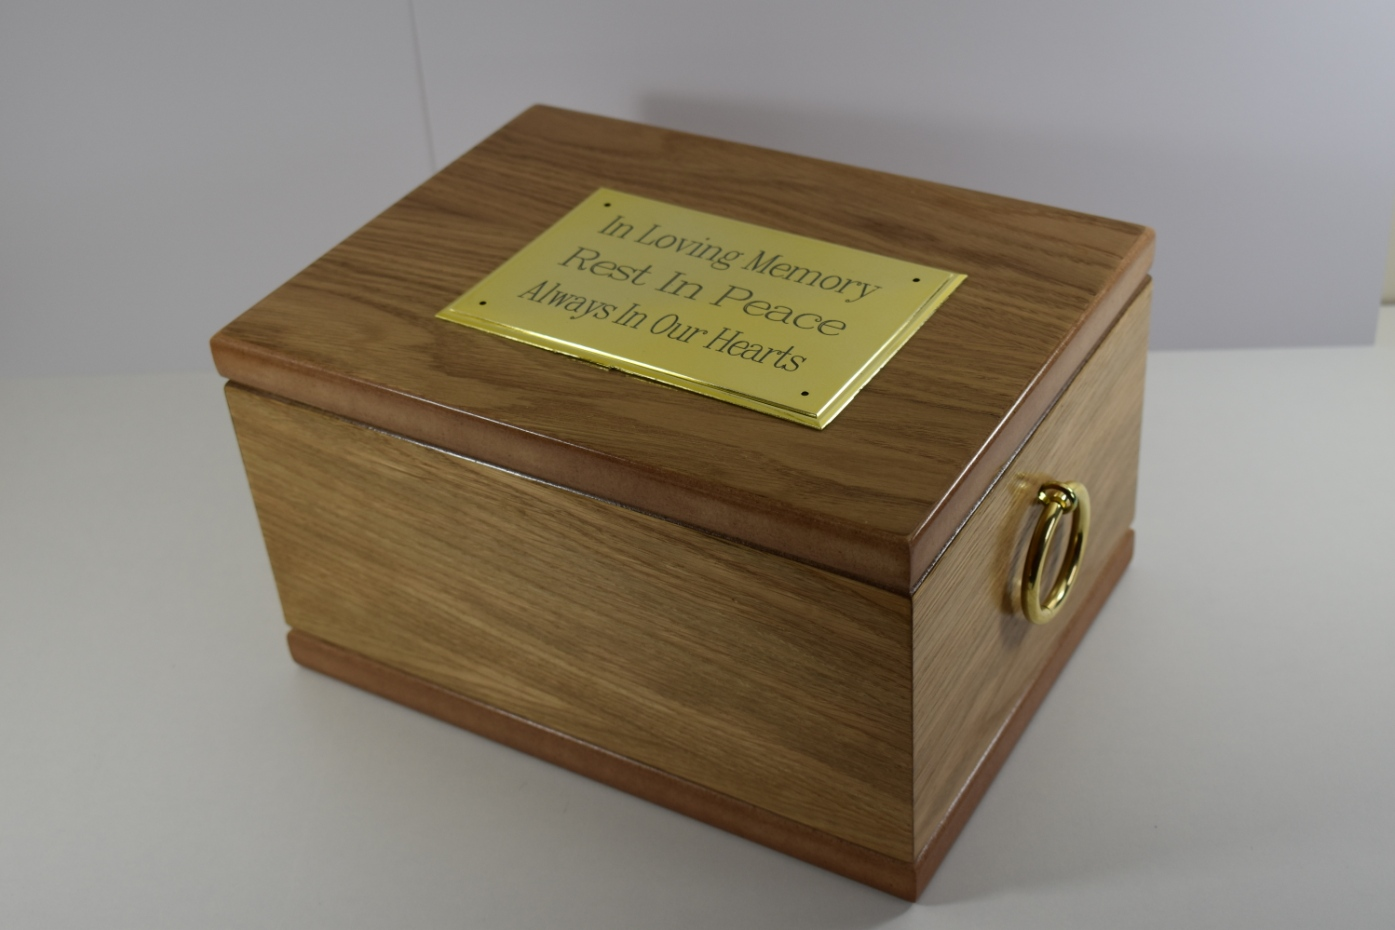 Balmoral Oak Veneered Ashes Casket